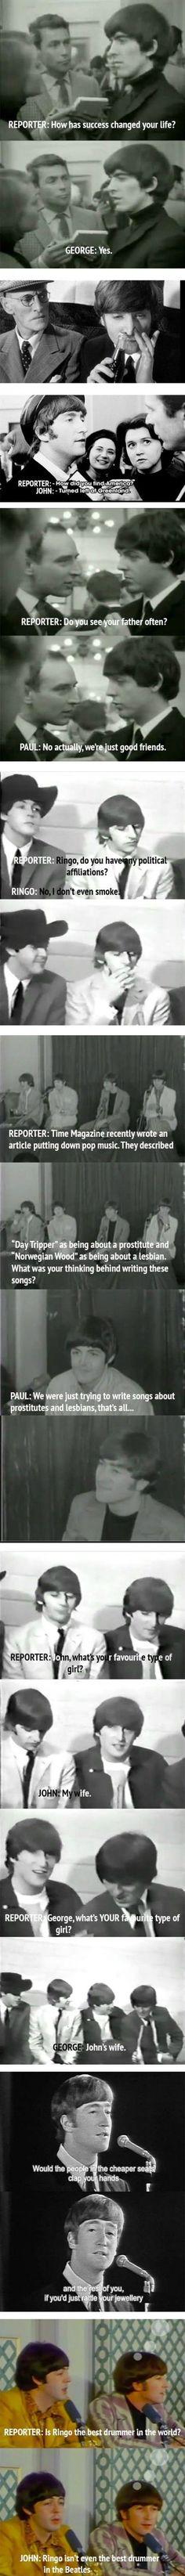 Beatlesian sarcasm - Imgur